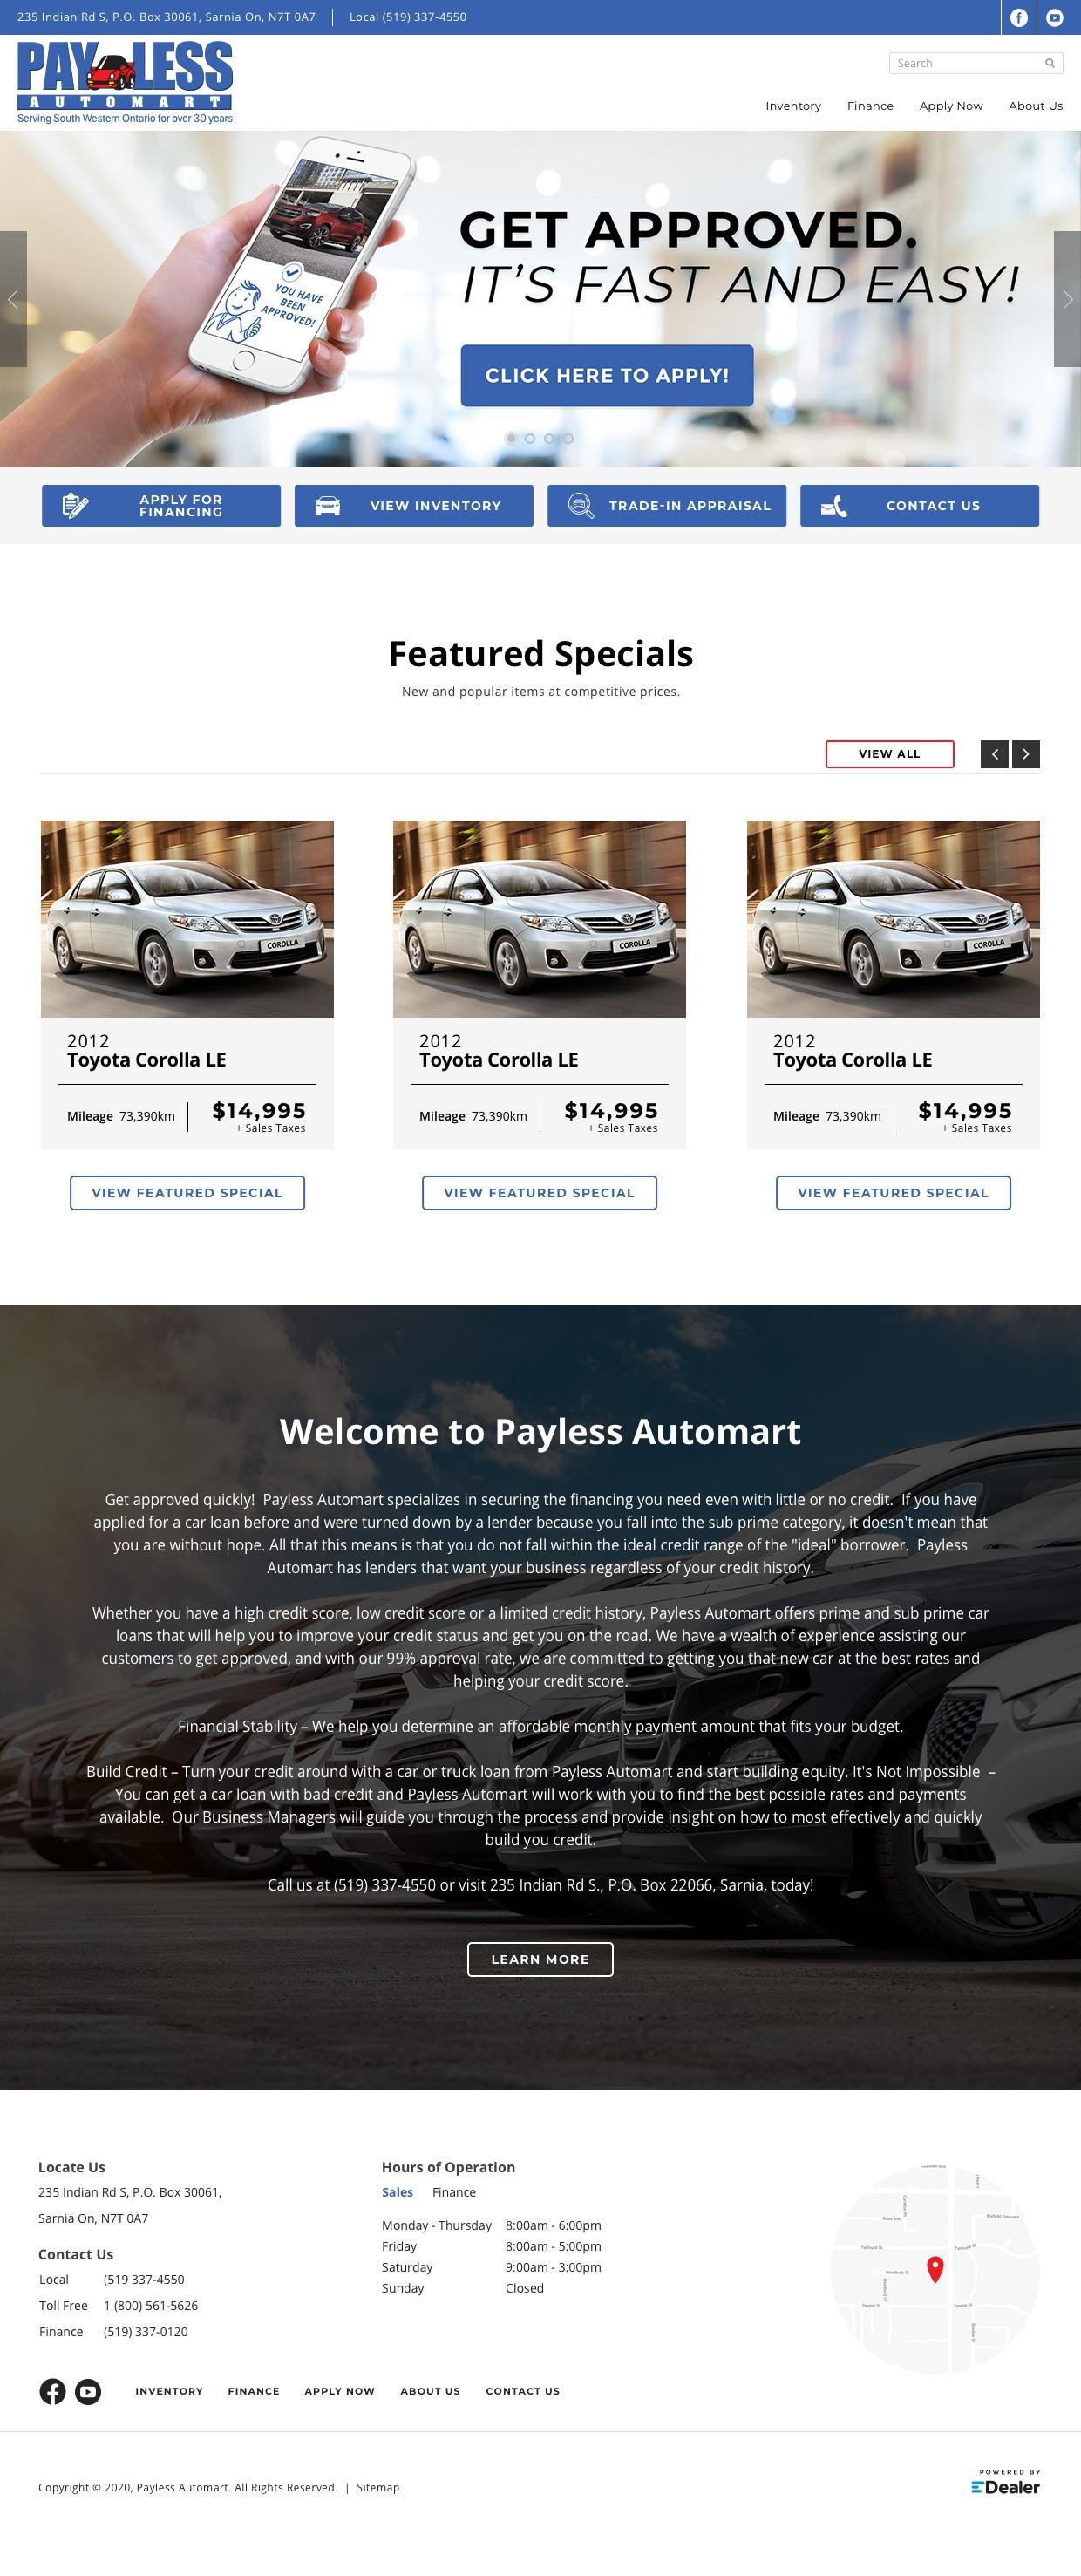 Payless Automart